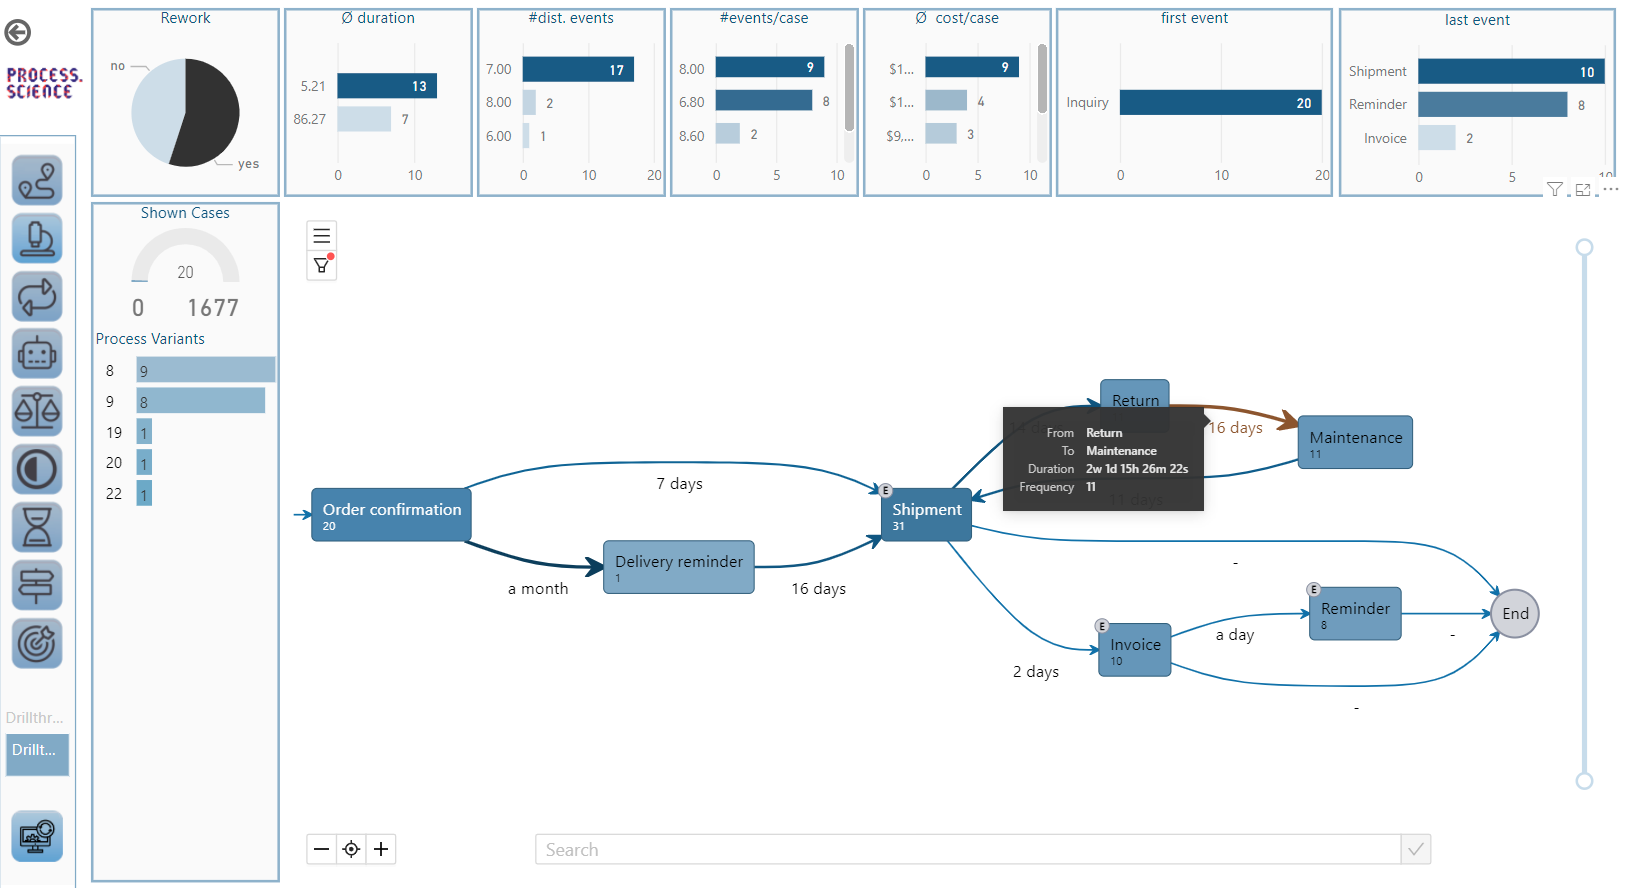 Power BI Dashboard with process graph